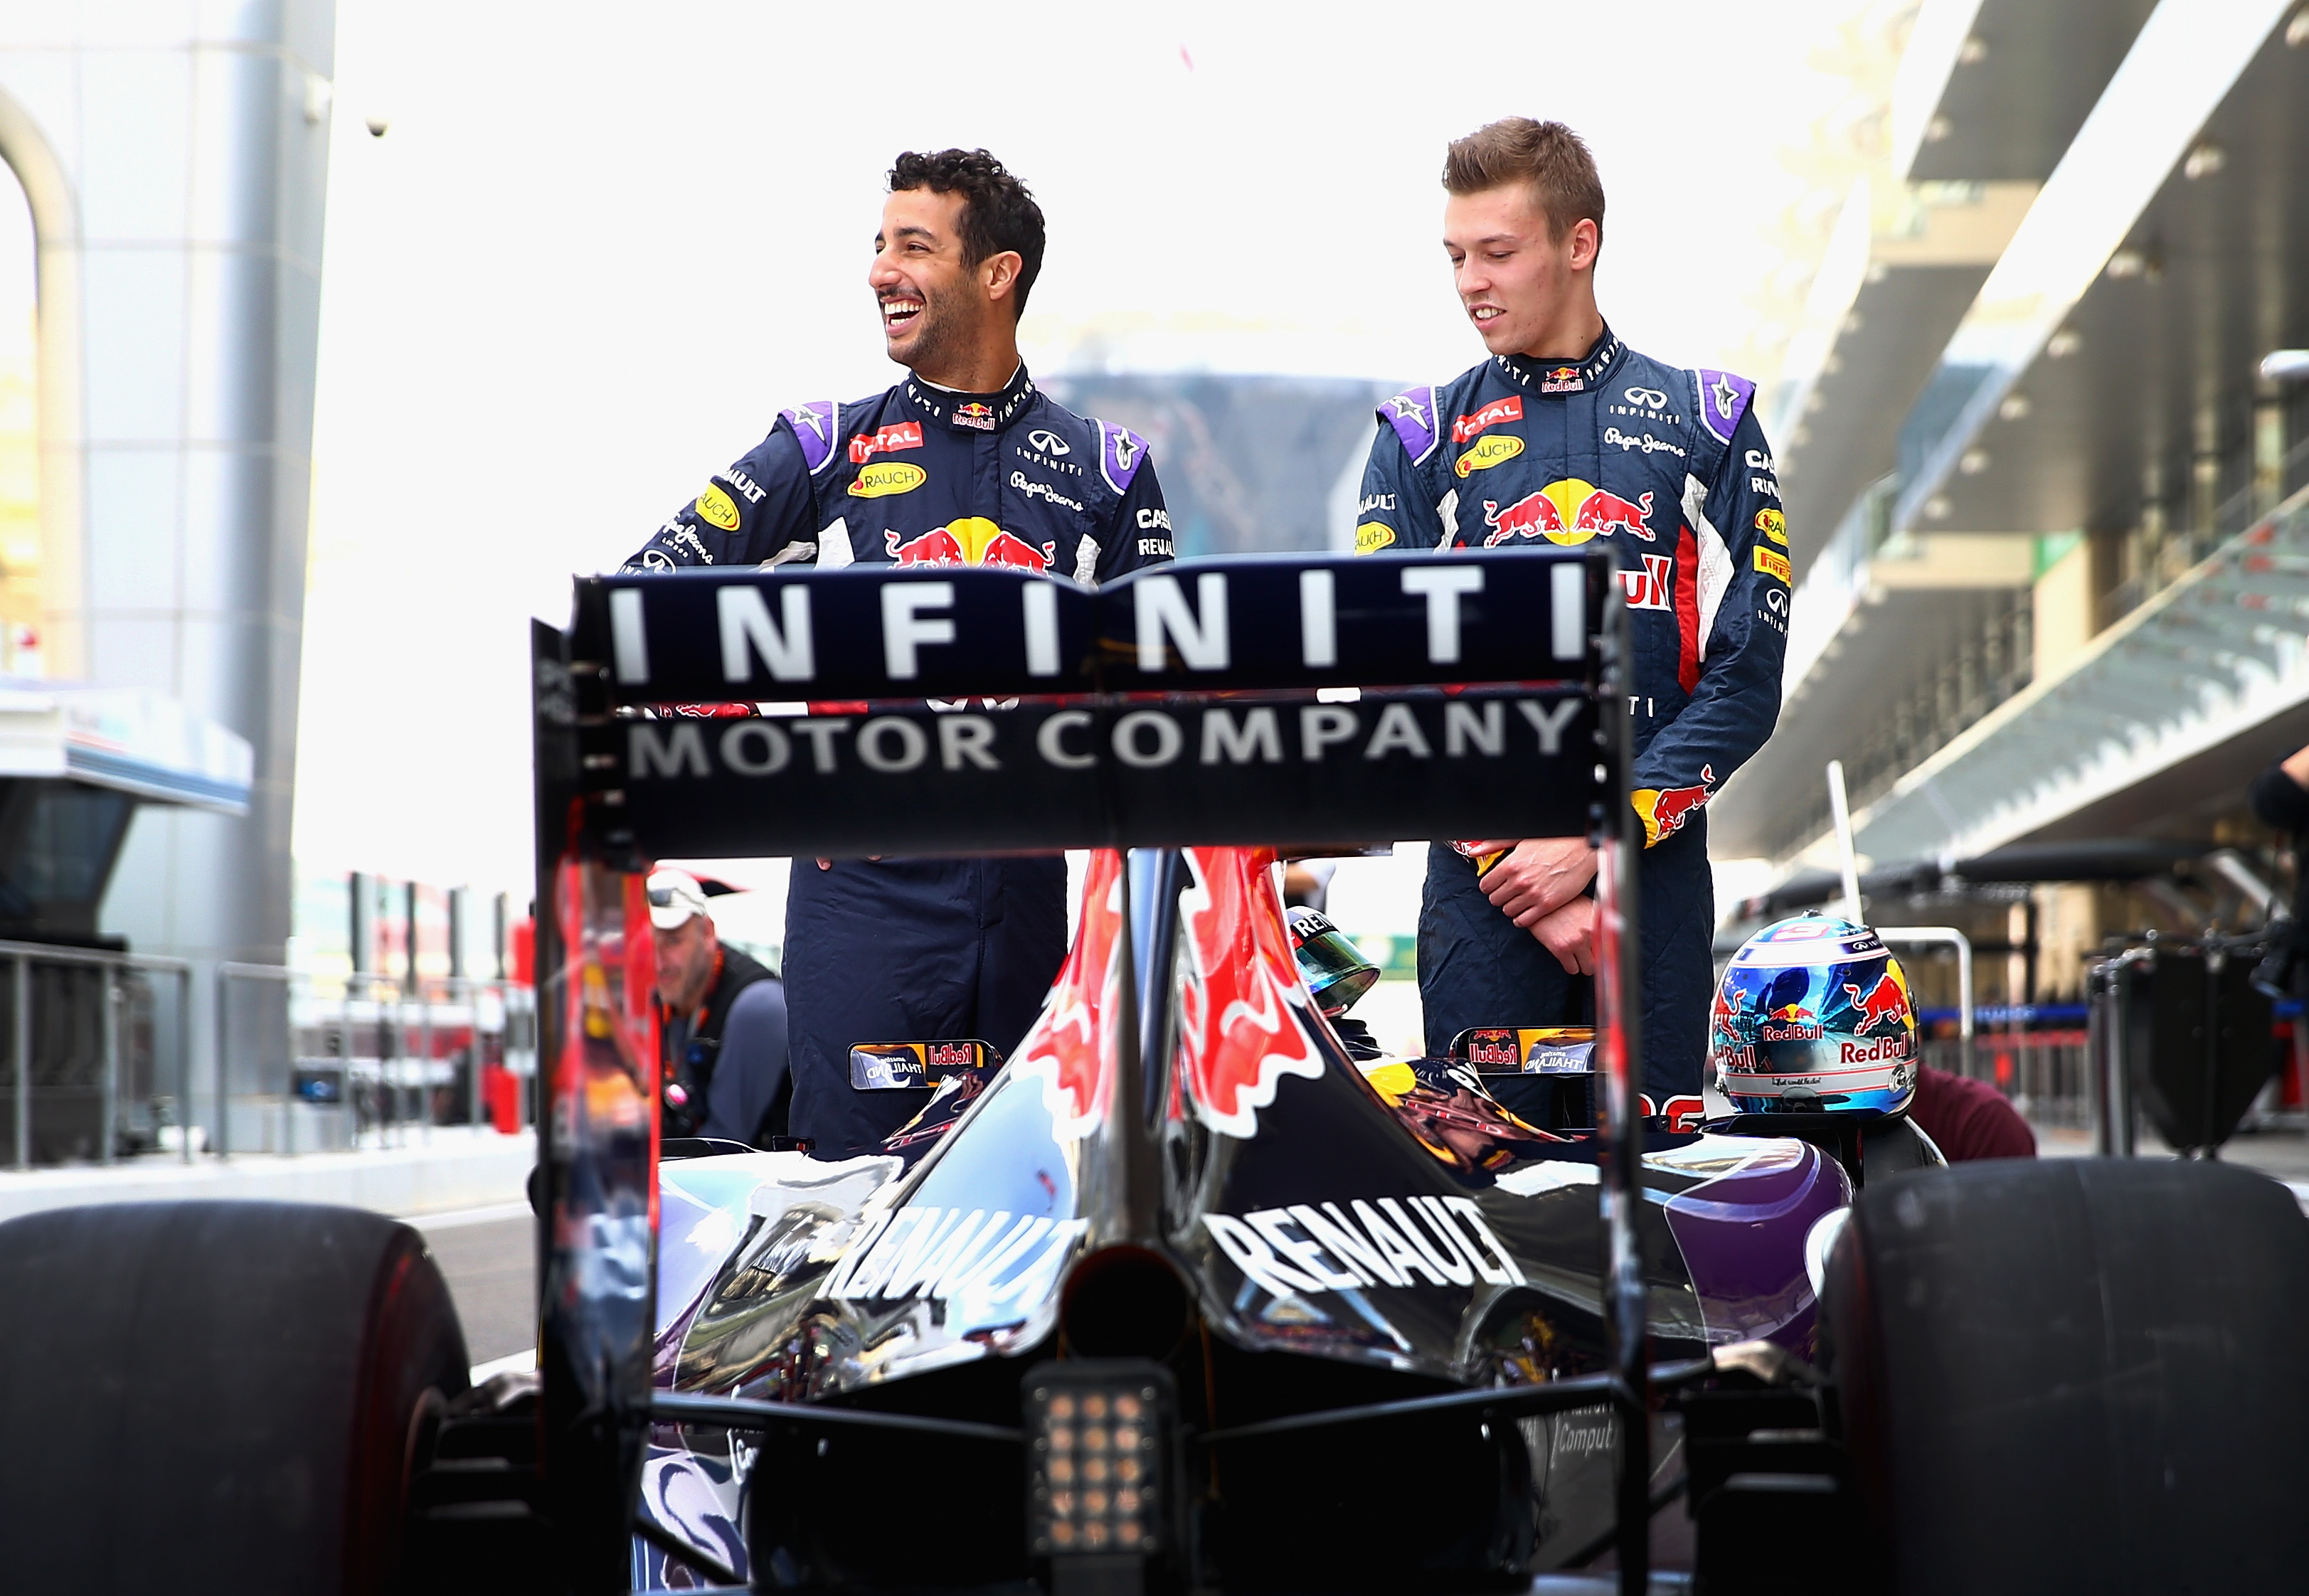 Motordeal Red Bull niet afhankelijk van Lotus (Foto: Red Bull)